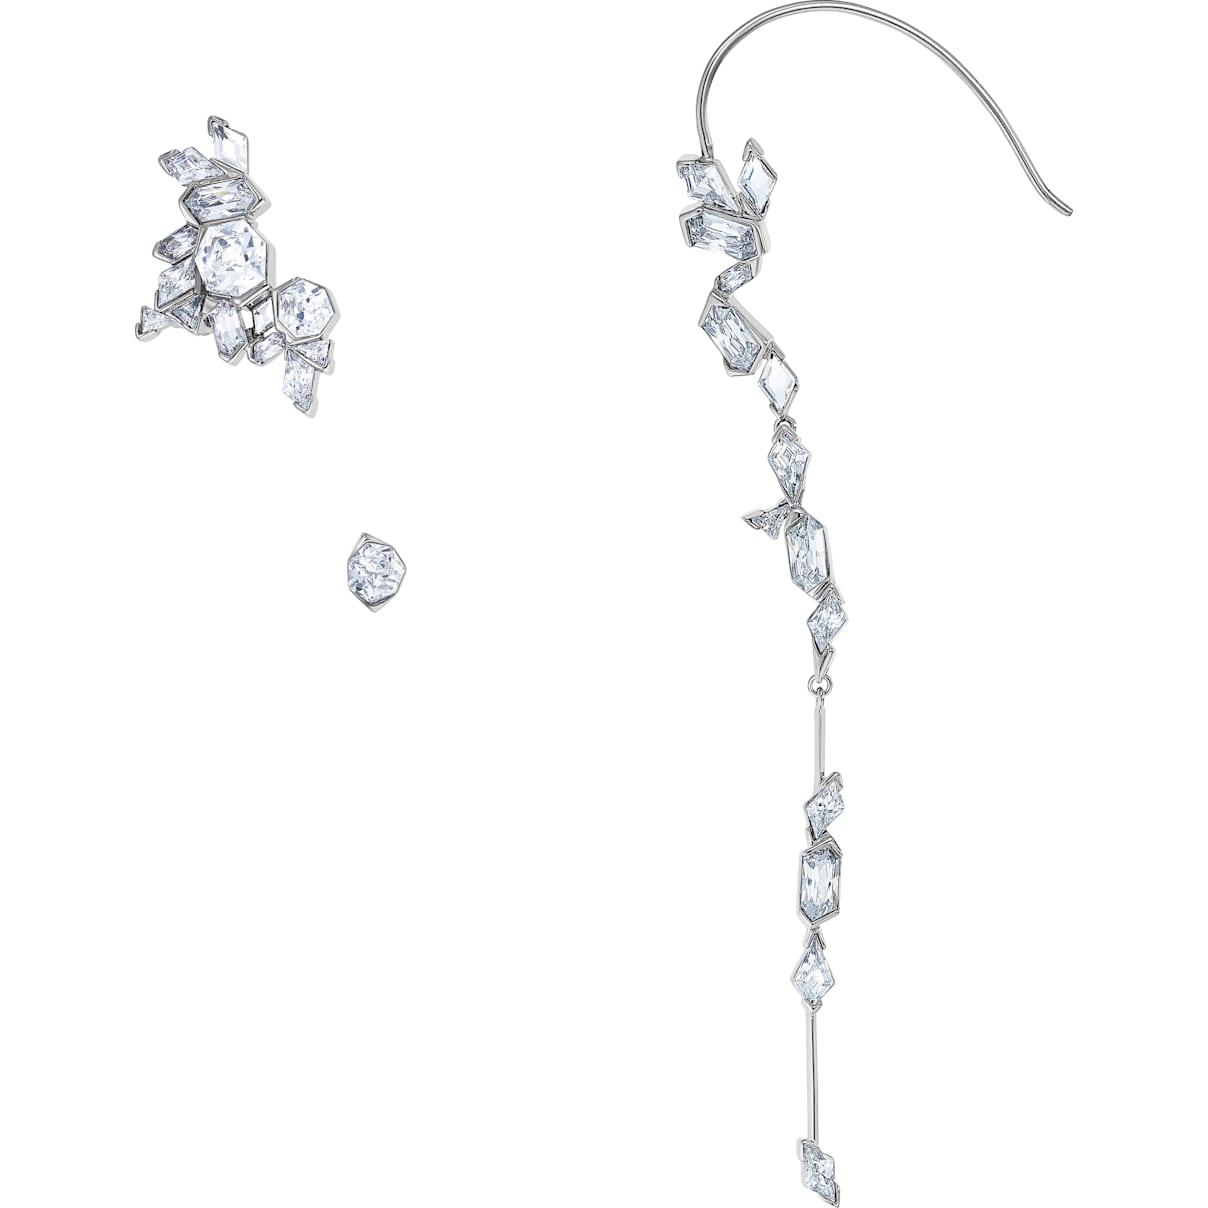 Swarovski Ice Crack Ear Cuff, White, Ruthenium plated